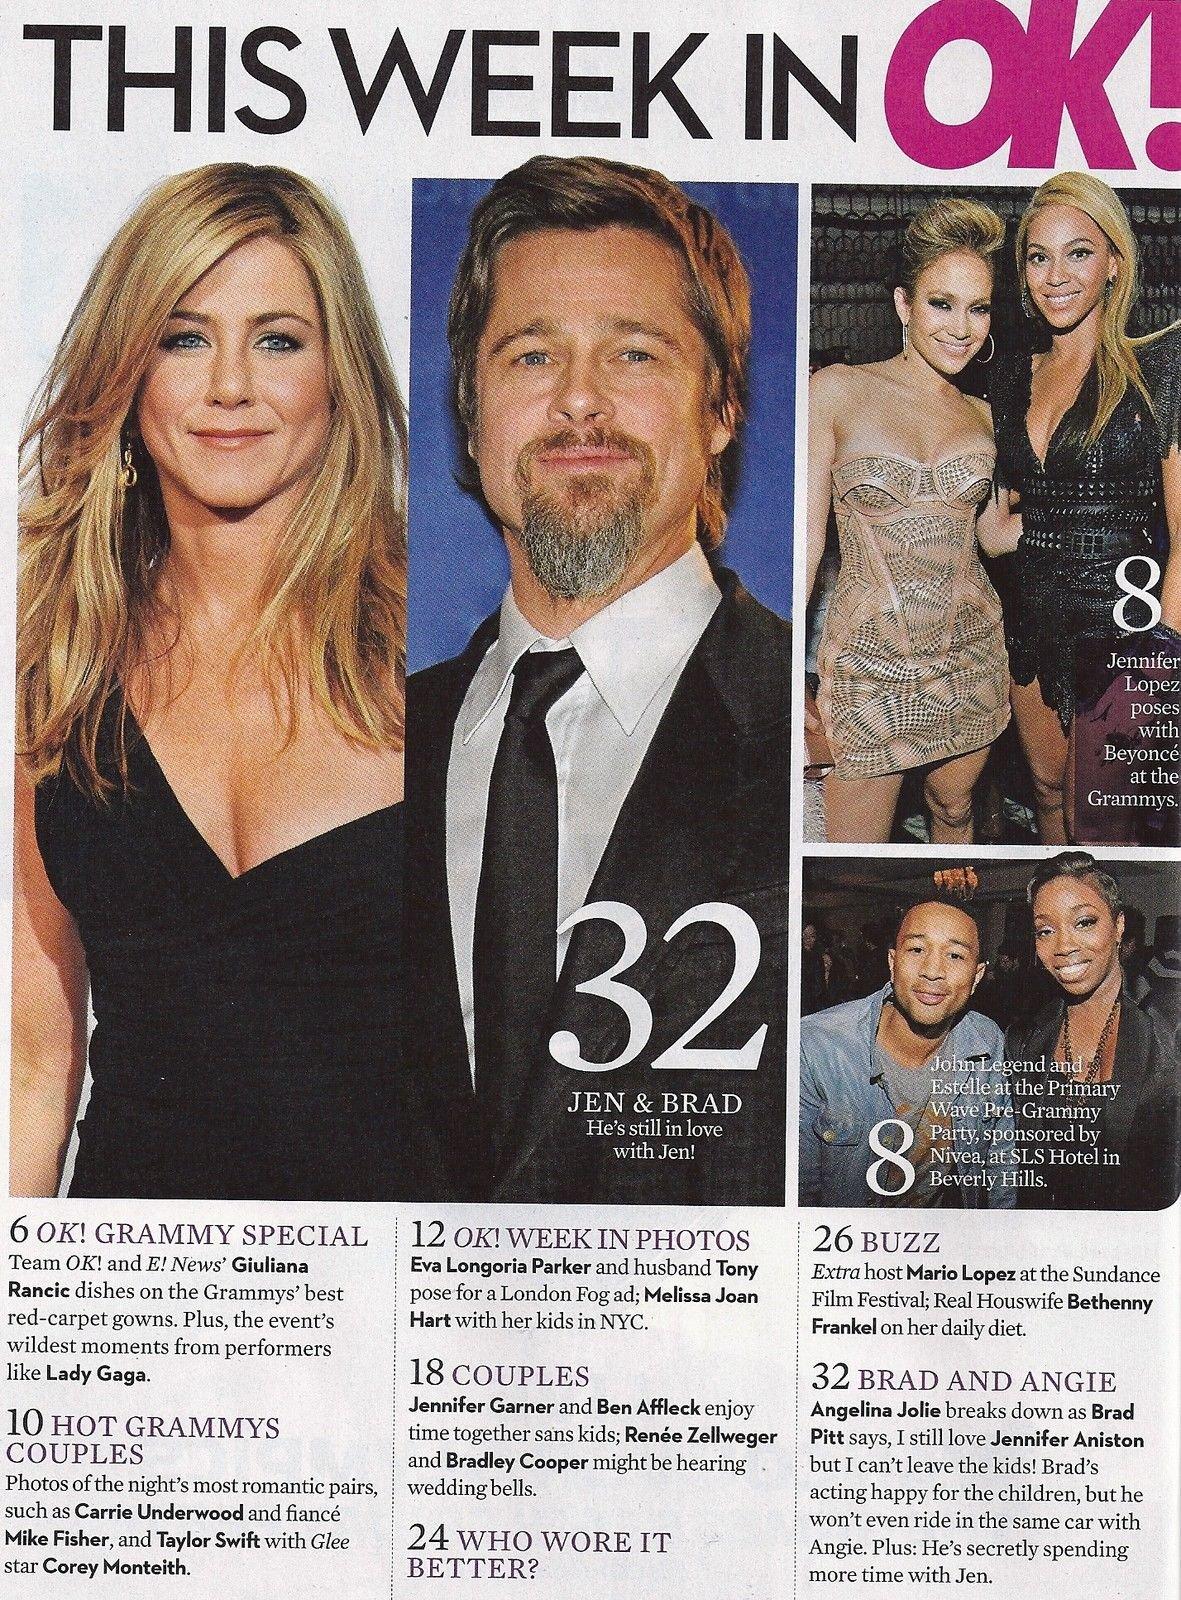 Brad Pitt/Jennifer Aniston/Angelina Jolie l Carrie Underwood